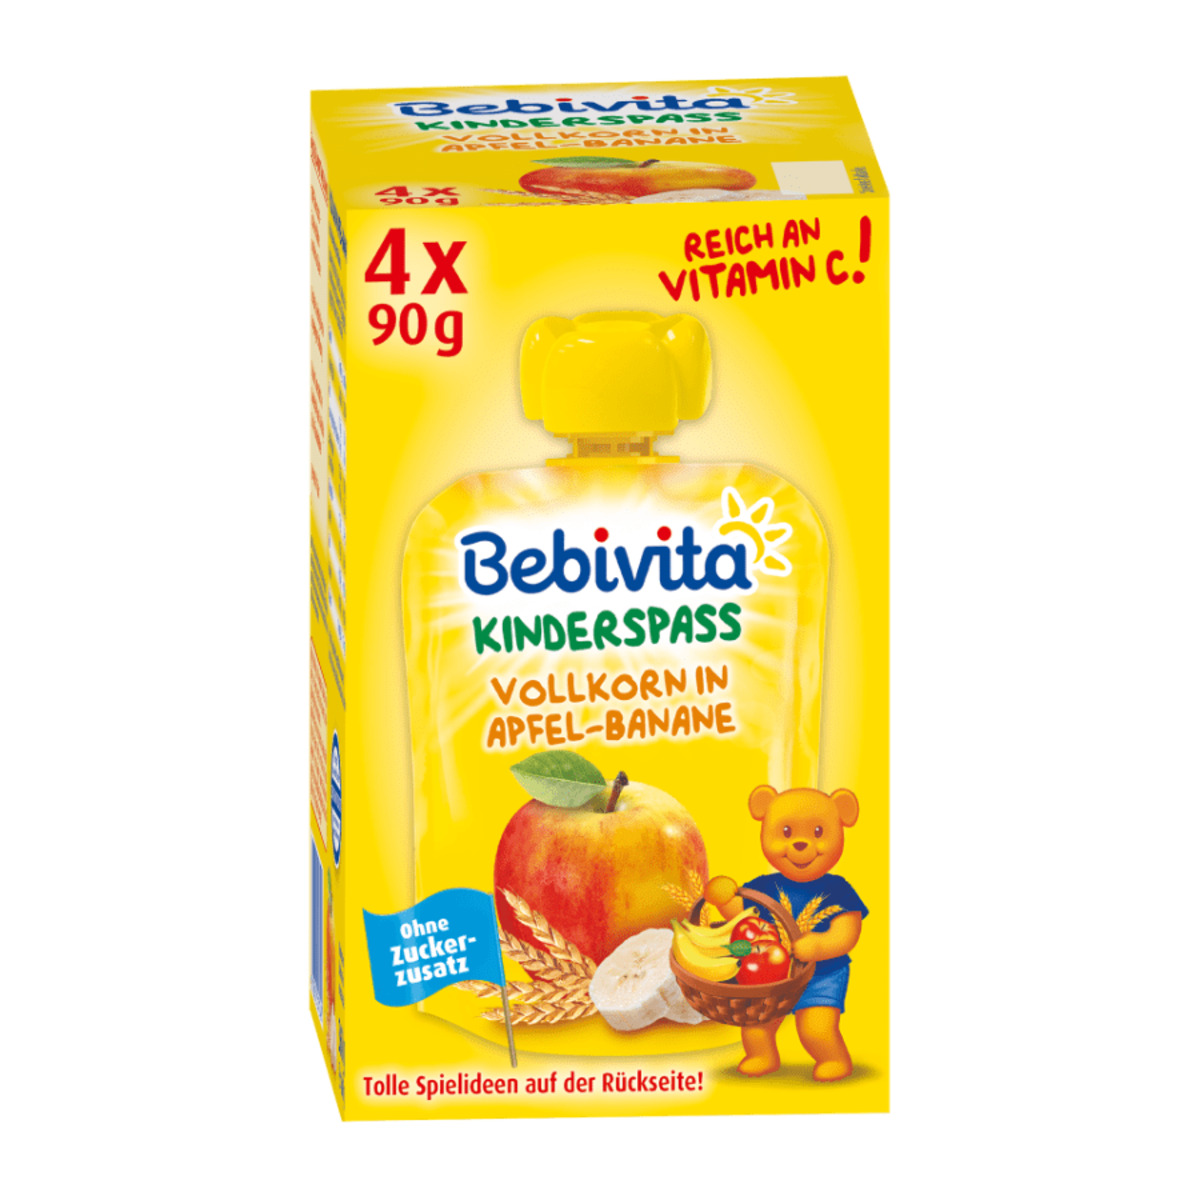 Bild 4 von Bebivita Kinderspaß